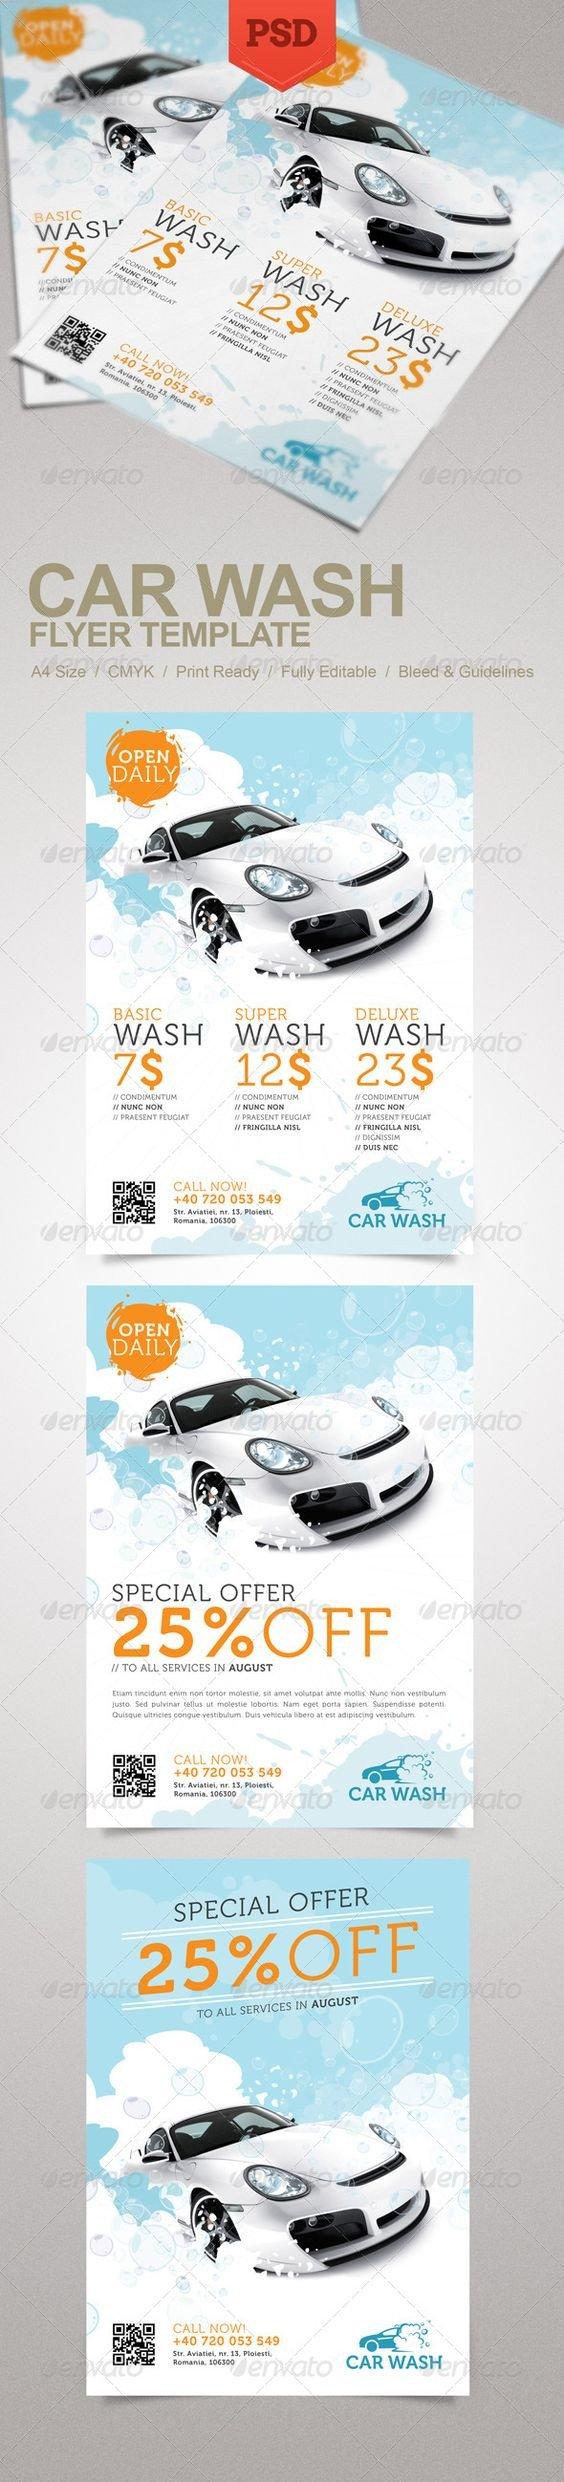 Auto Detailing Flyer Template Car Wash Flyer